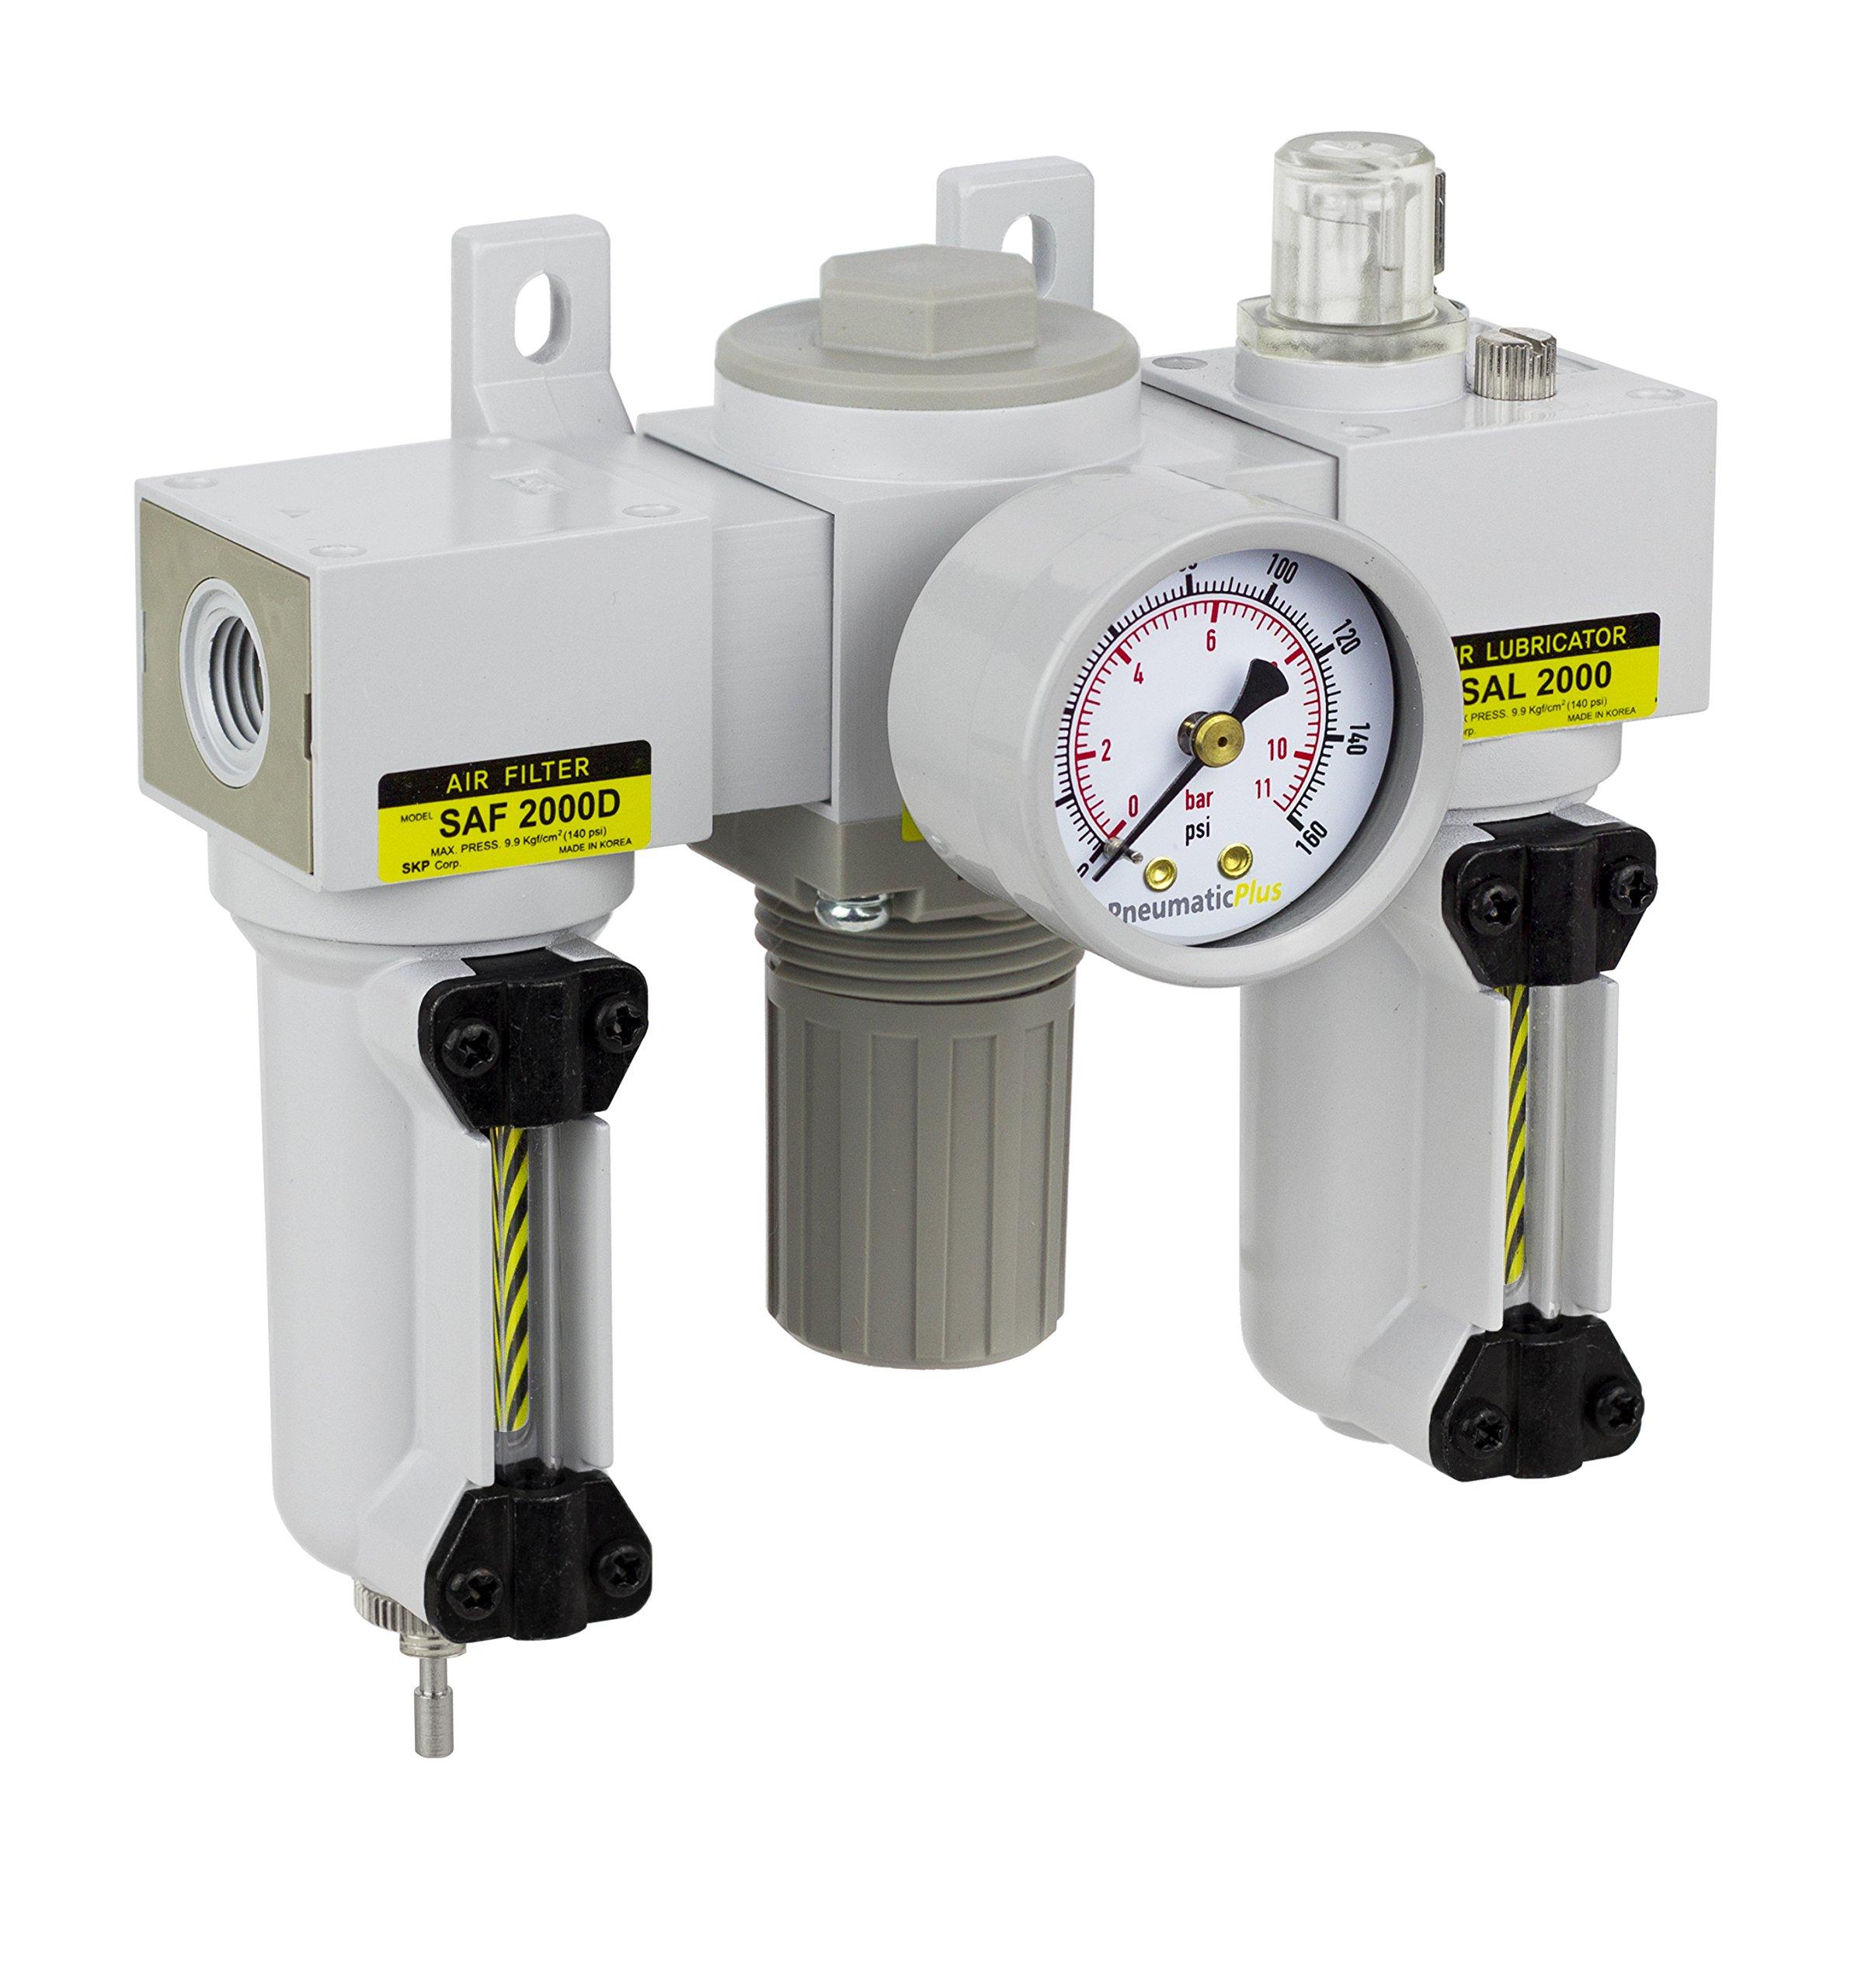 PneumaticPlus SAU2000M-N02G-MEP Mini Three-Unit Combo Compressed Air Filter Regulator Lubricator FRL, Air Preparation Unit 1/4'' NPT - Metal Bowl, Manual Drain, Gauge by PneumaticPlus